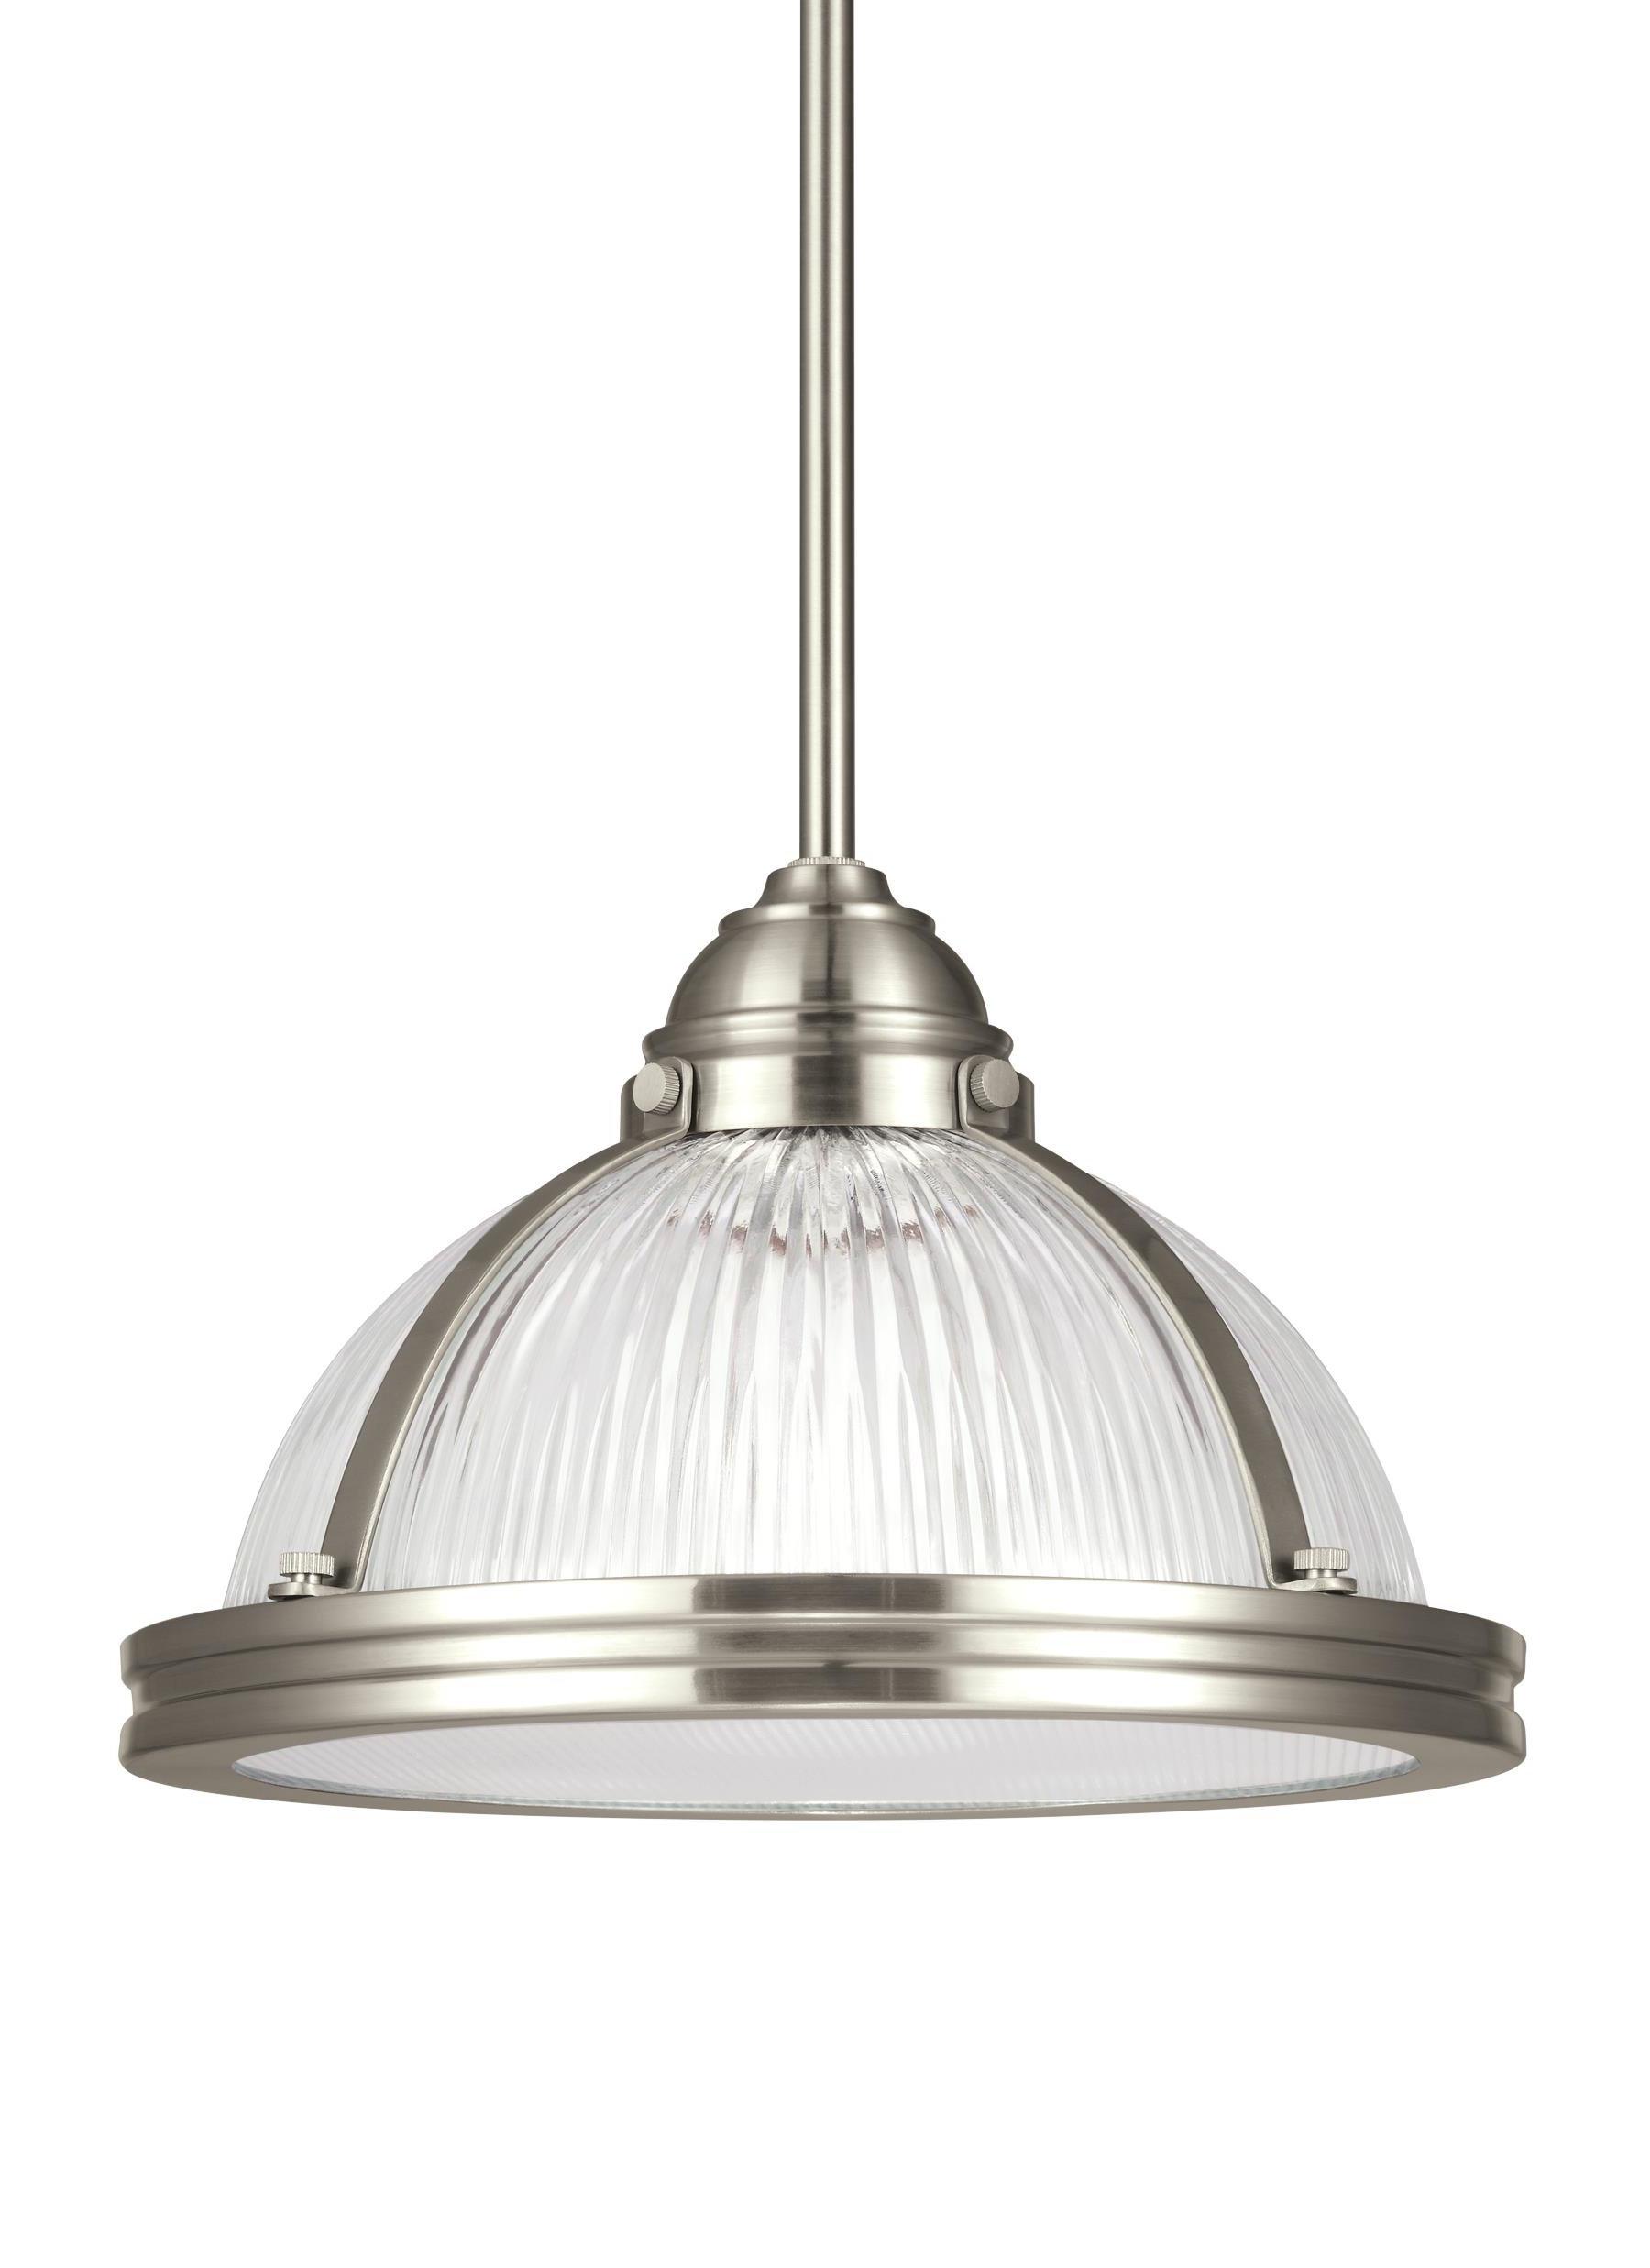 2020 Granville 2 Light Single Dome Pendants Intended For 1 Light Bowl Pendant (View 9 of 20)